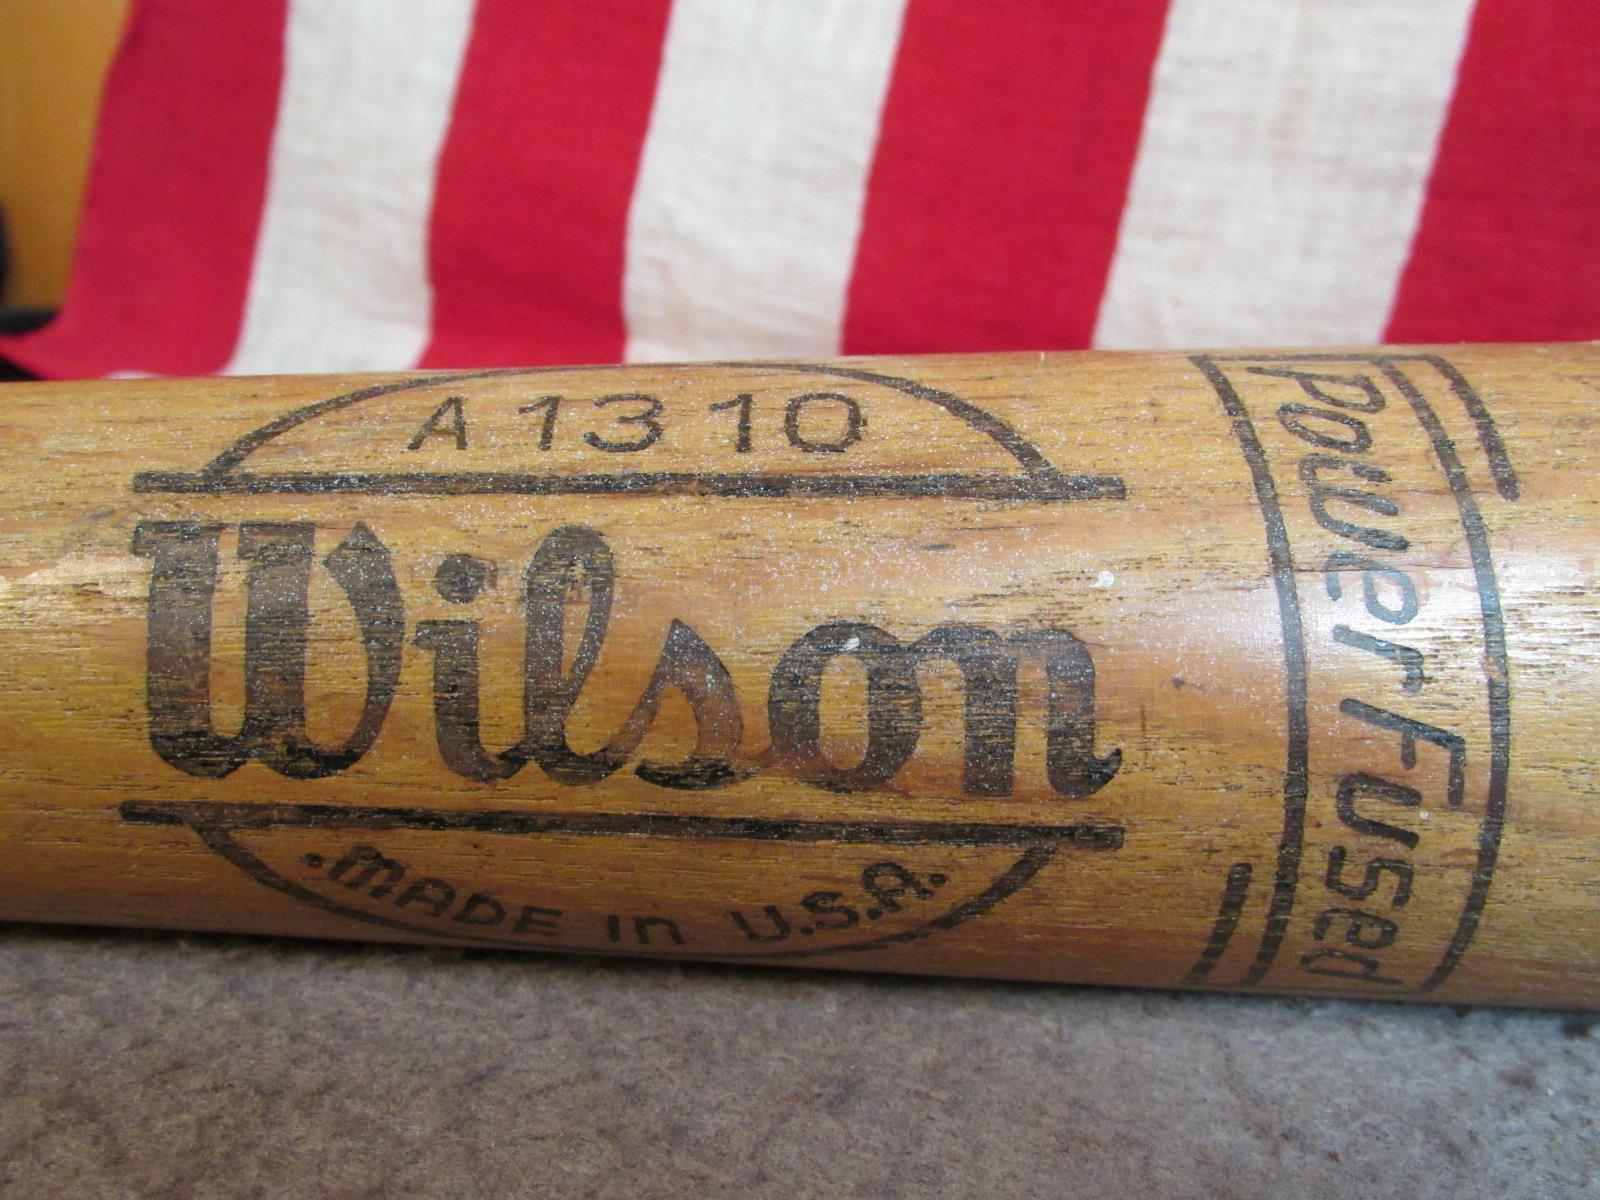 Vintage Wilson Holz Berühmte Spieler Baseballschläger Ferris Fain Special Modell